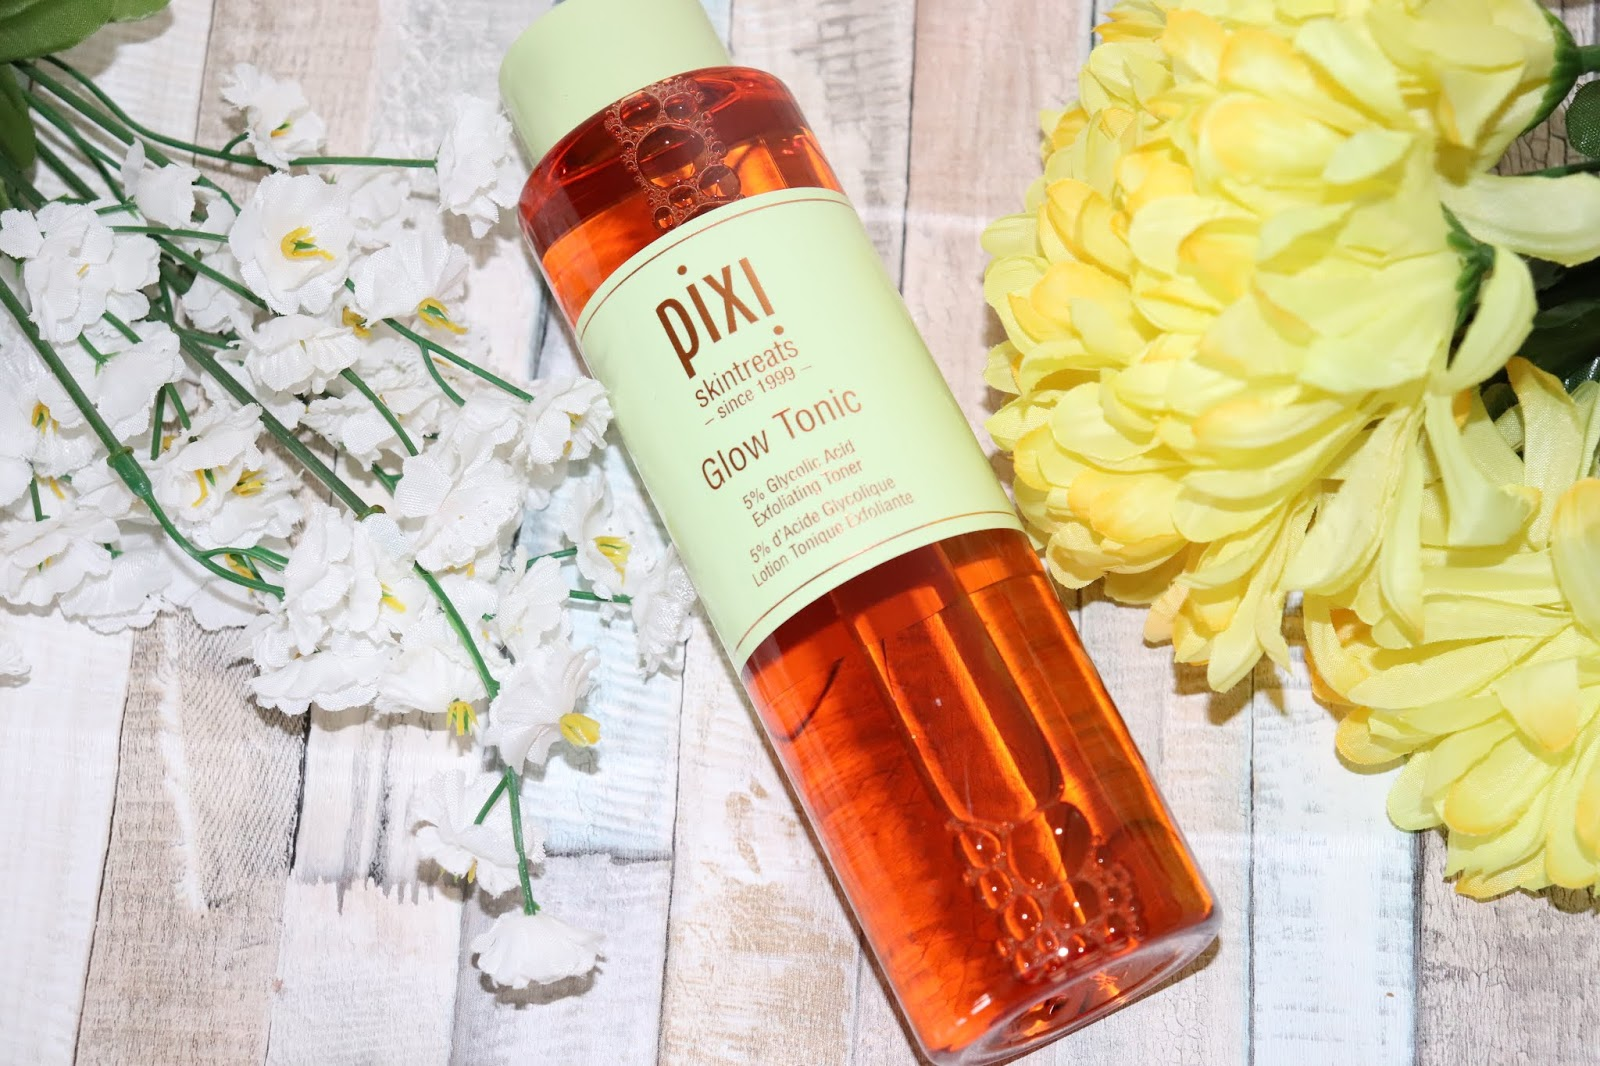 Laustworld: Pixi Glow Tonic Review: Transform Your Skin